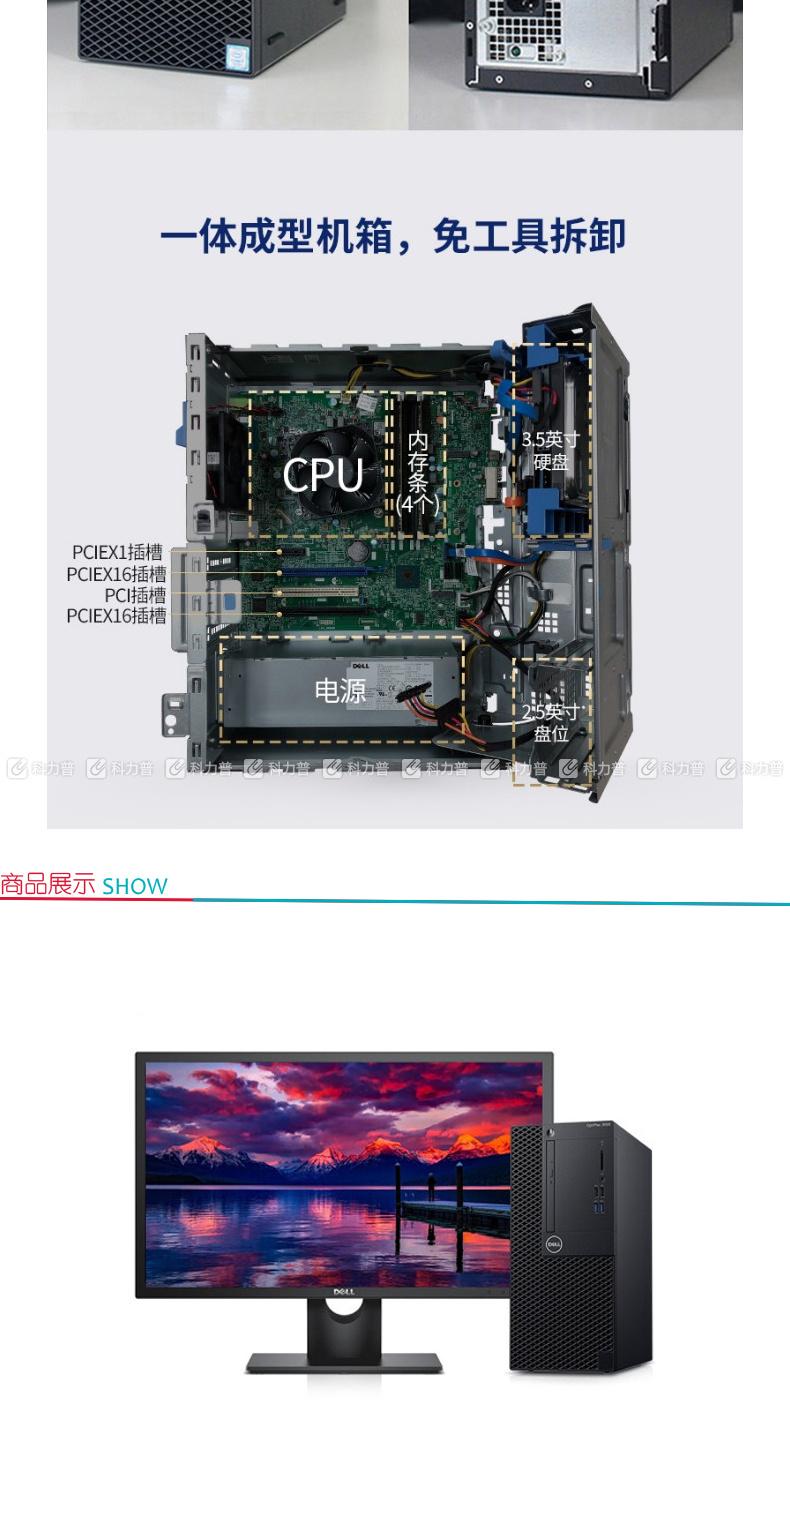 戴尔 DELL 台式电脑套机 OptiPlex 7060 Micro 230595 23.8英寸 E2417H i7-8700T 16G 1TB+256G SSD 无光驱 无线蓝牙 集显 DOS 3年上门